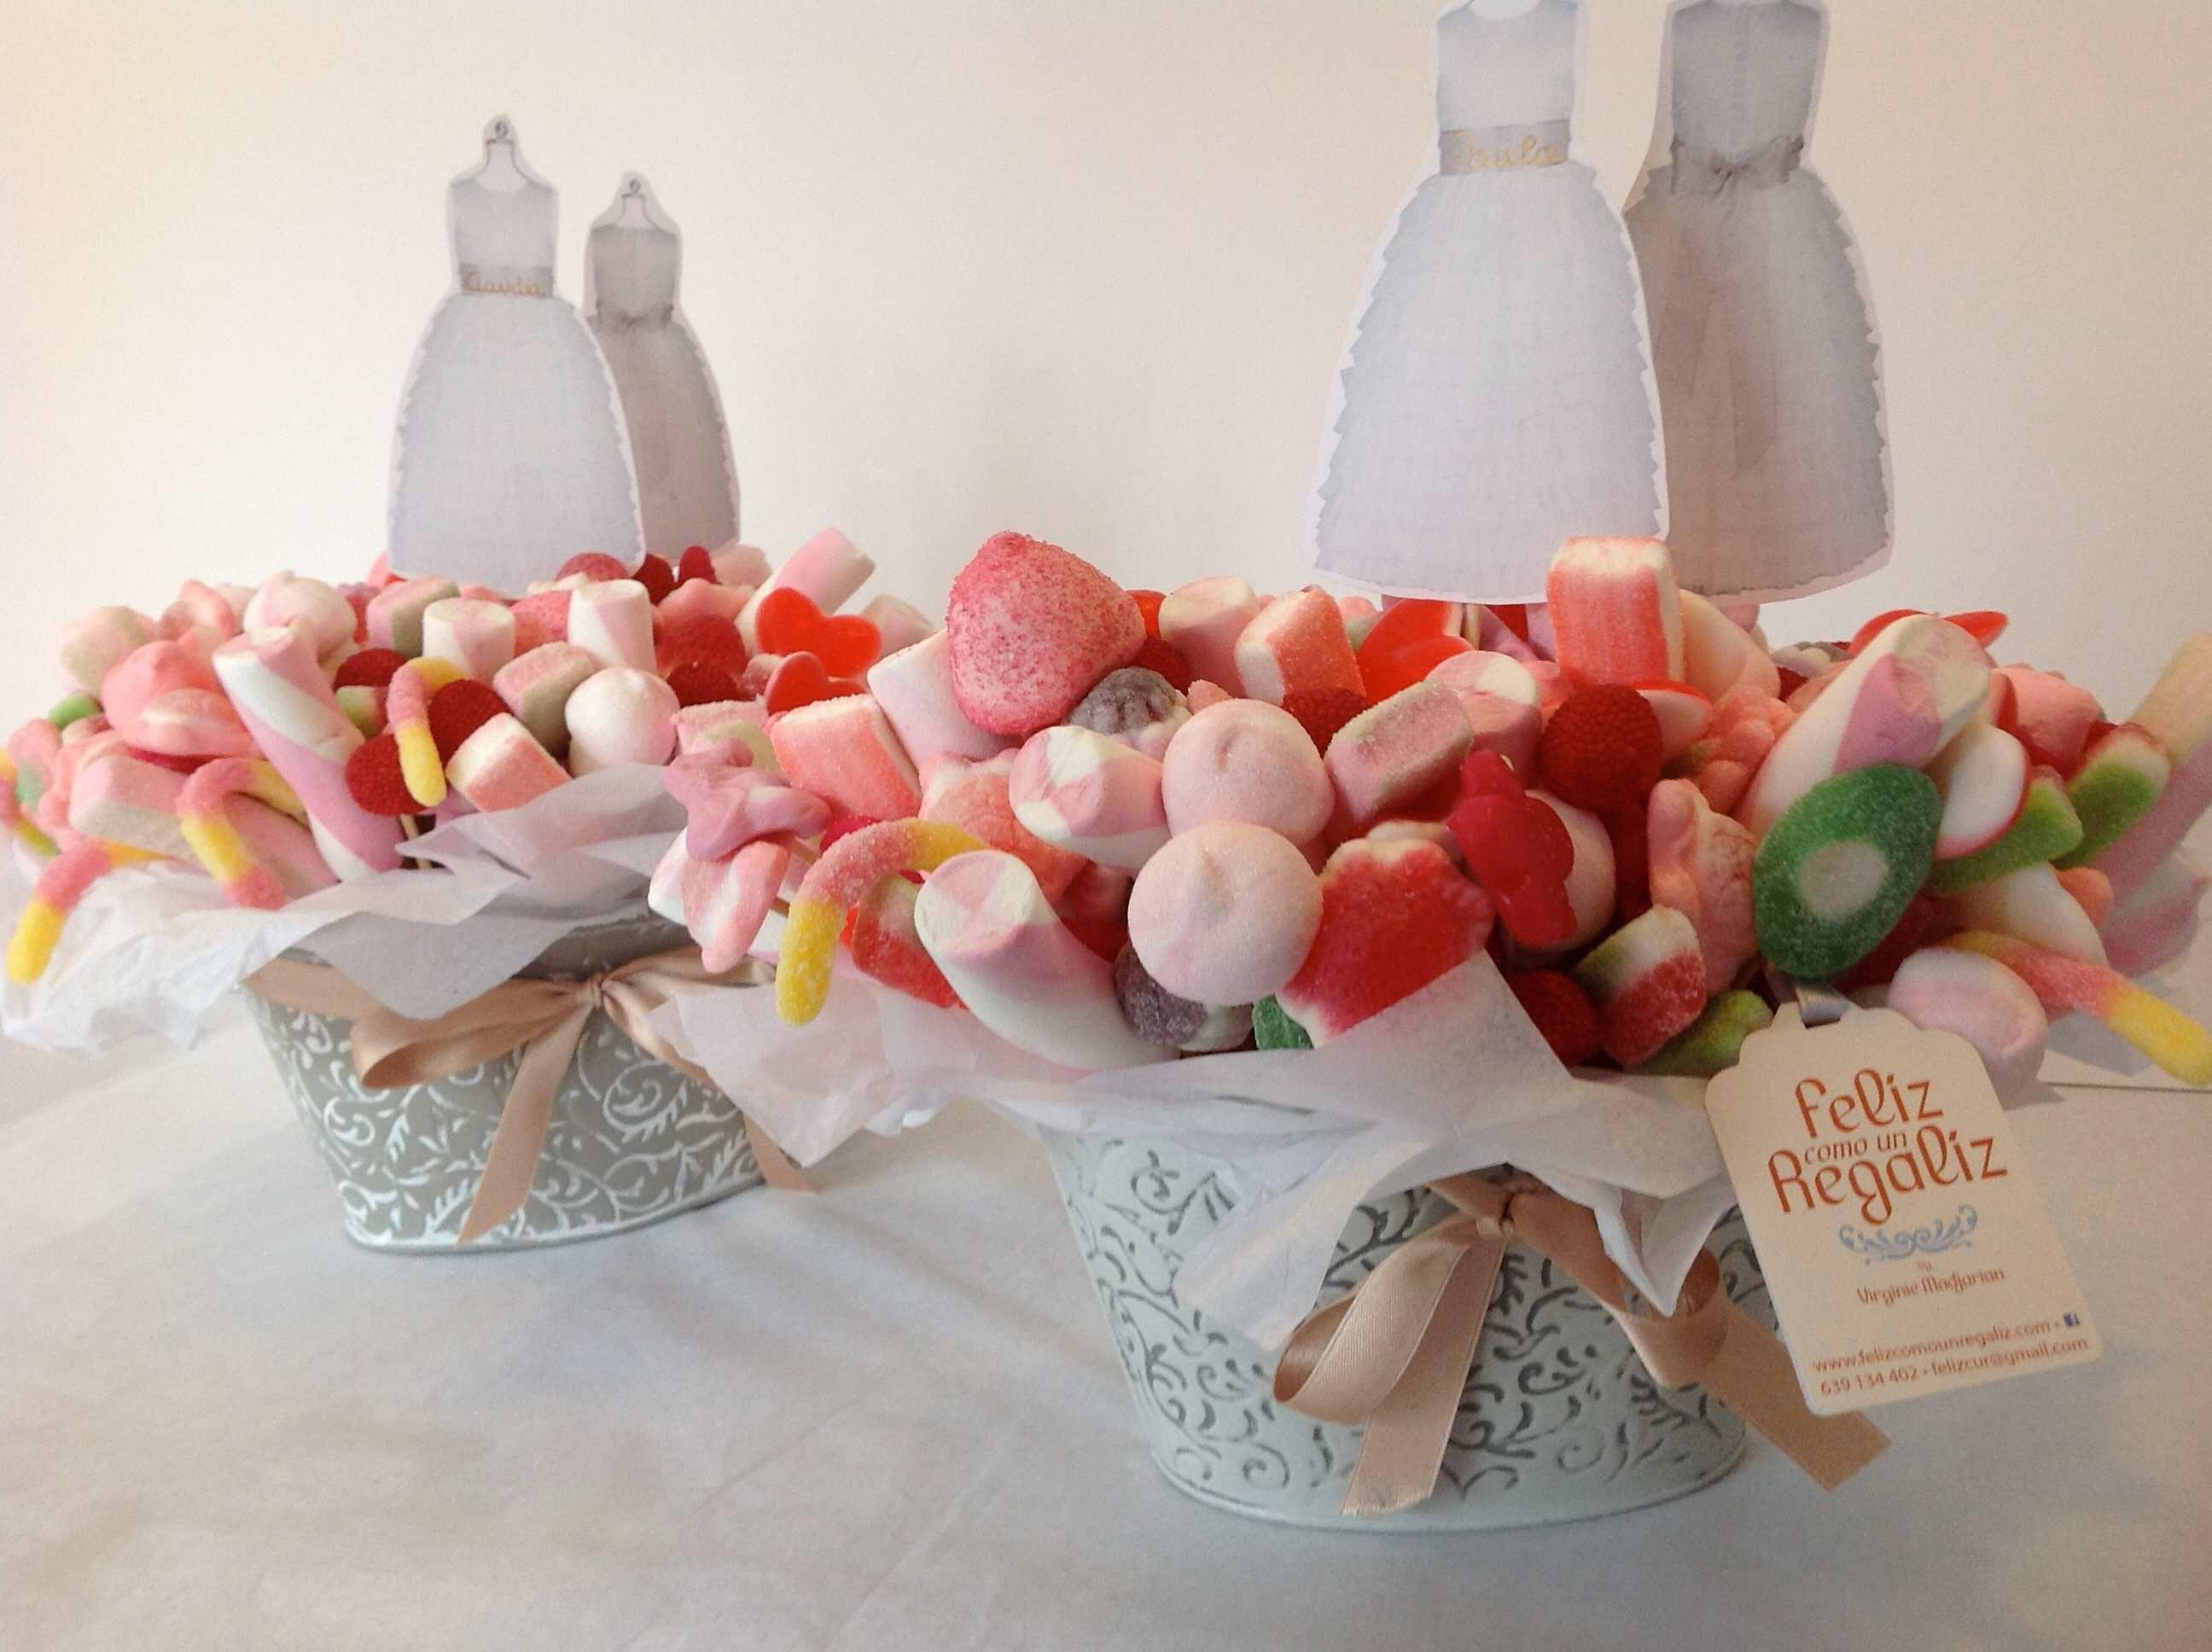 centros de chuches, caramelos y golosinas para mesas dulces Bautizo y Comunion